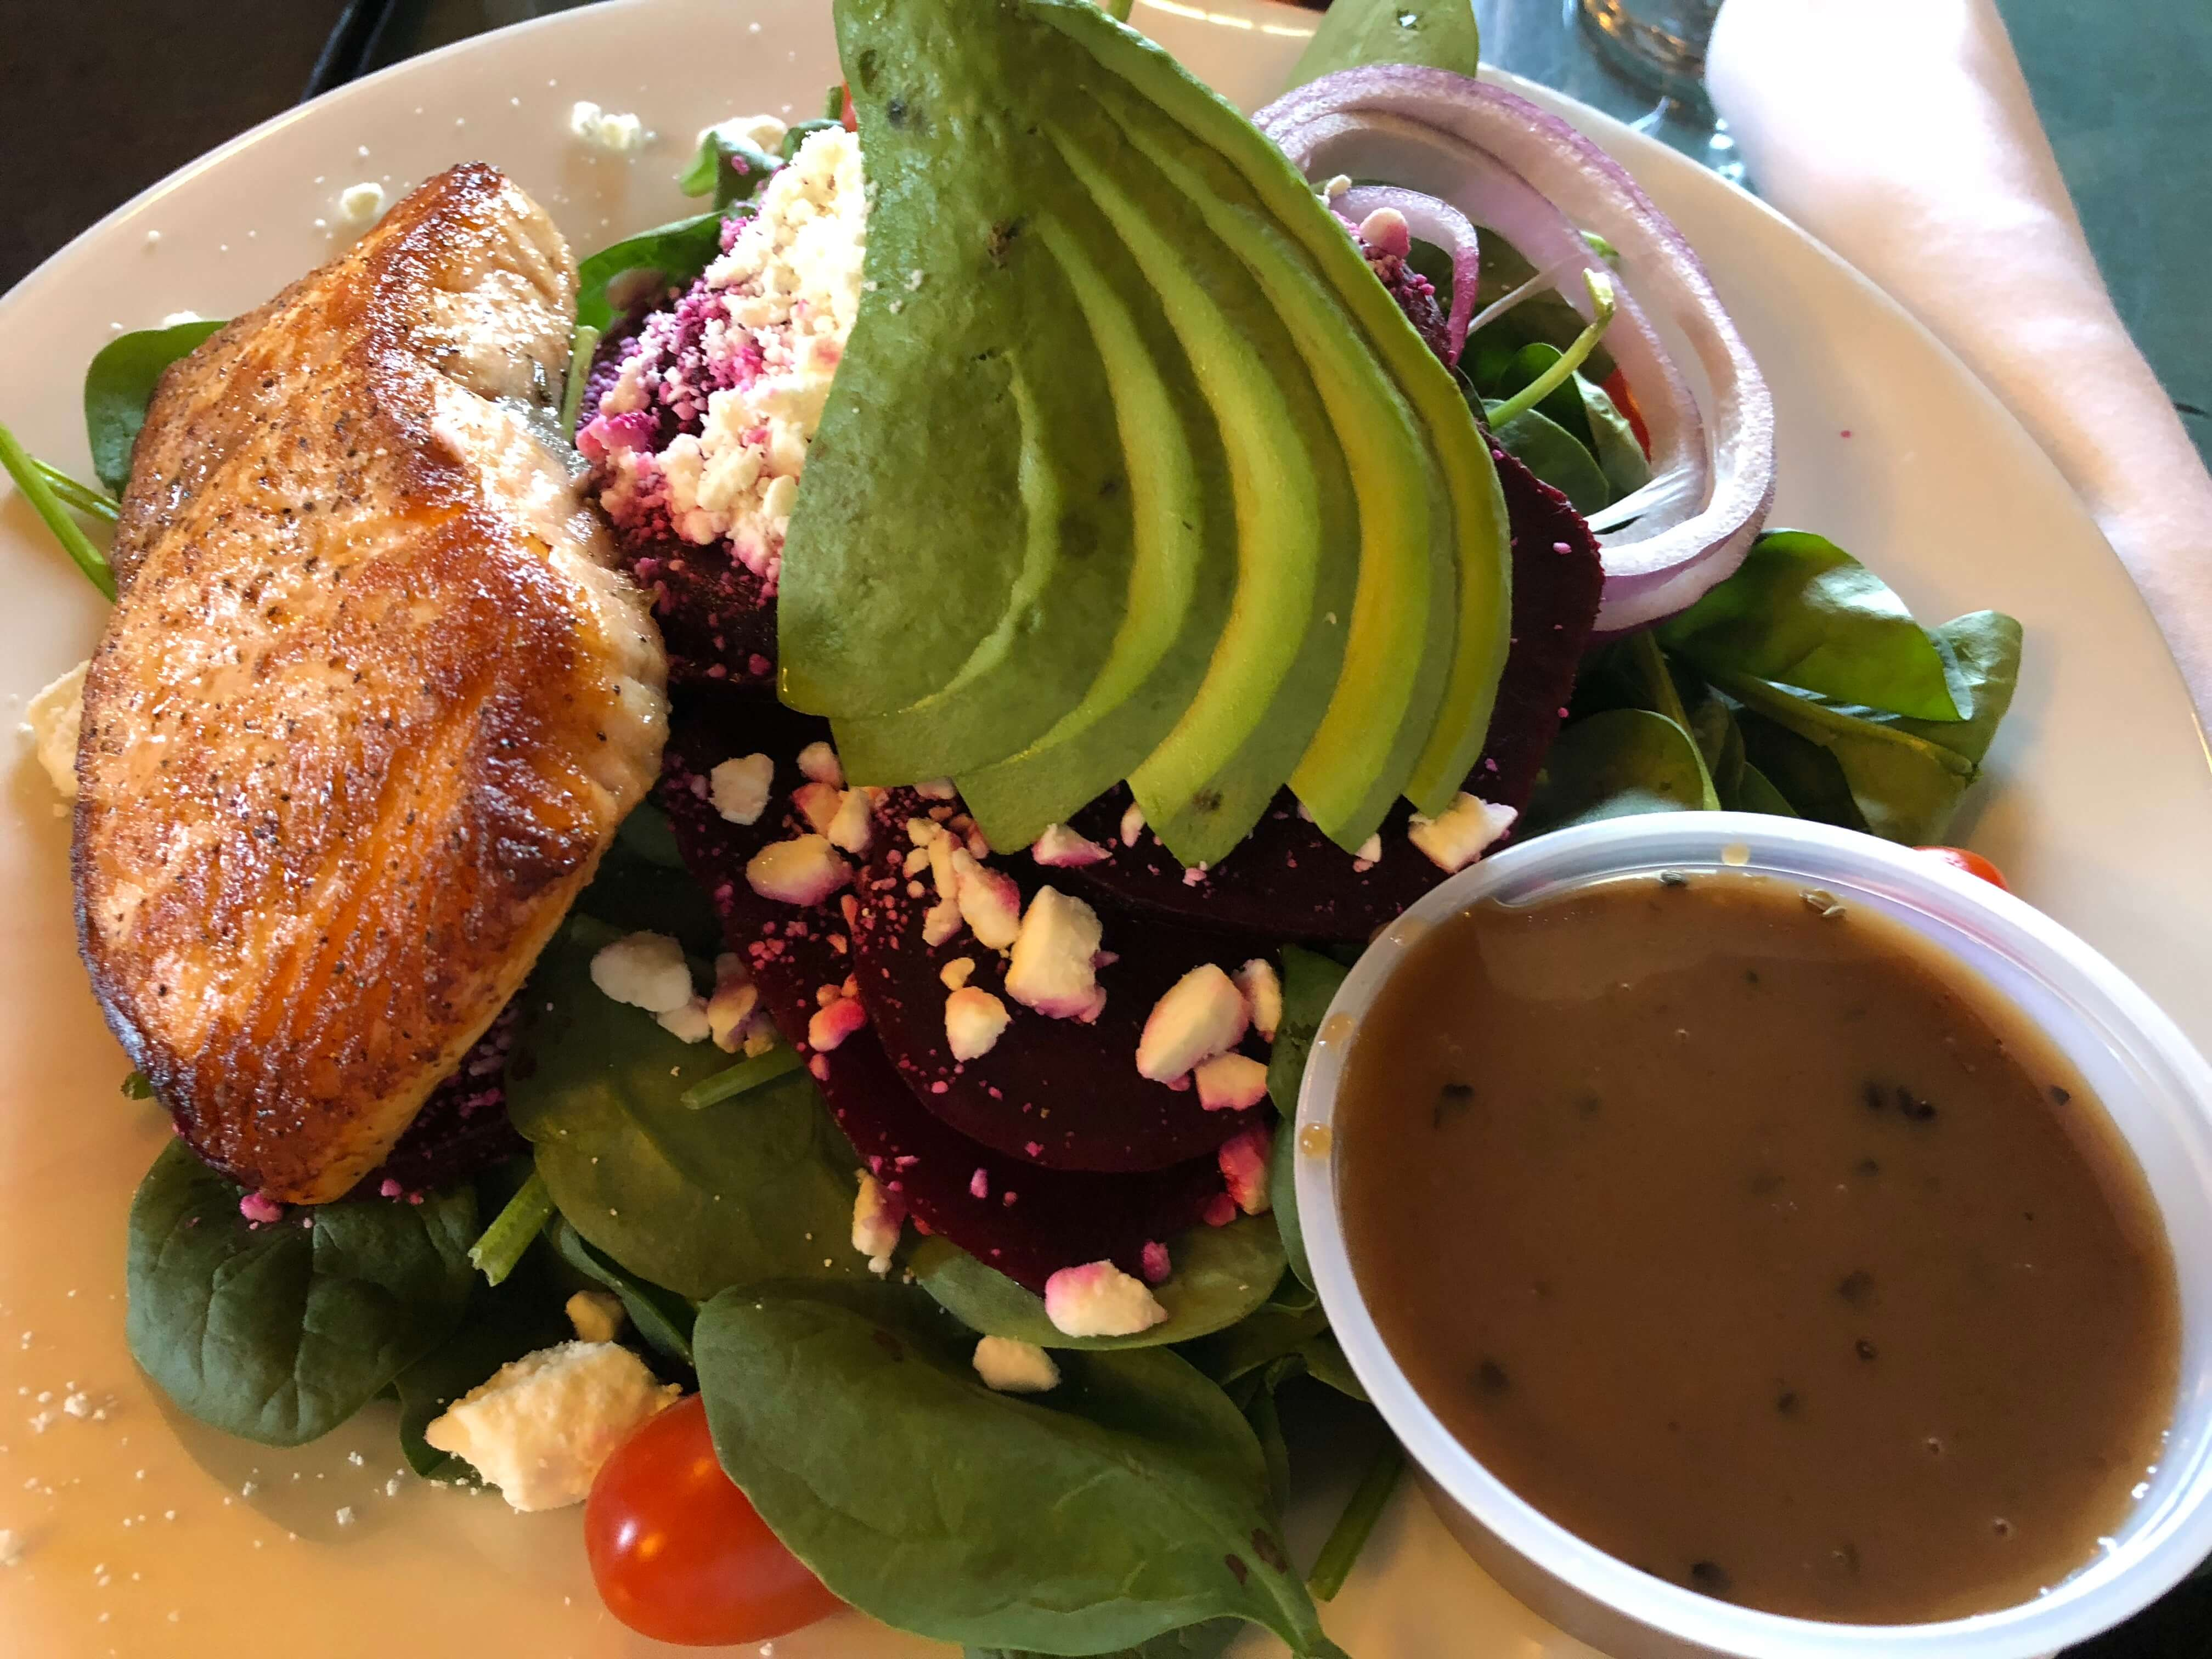 Mahoney's Irish Pub & Steakhouse salad dutchess county